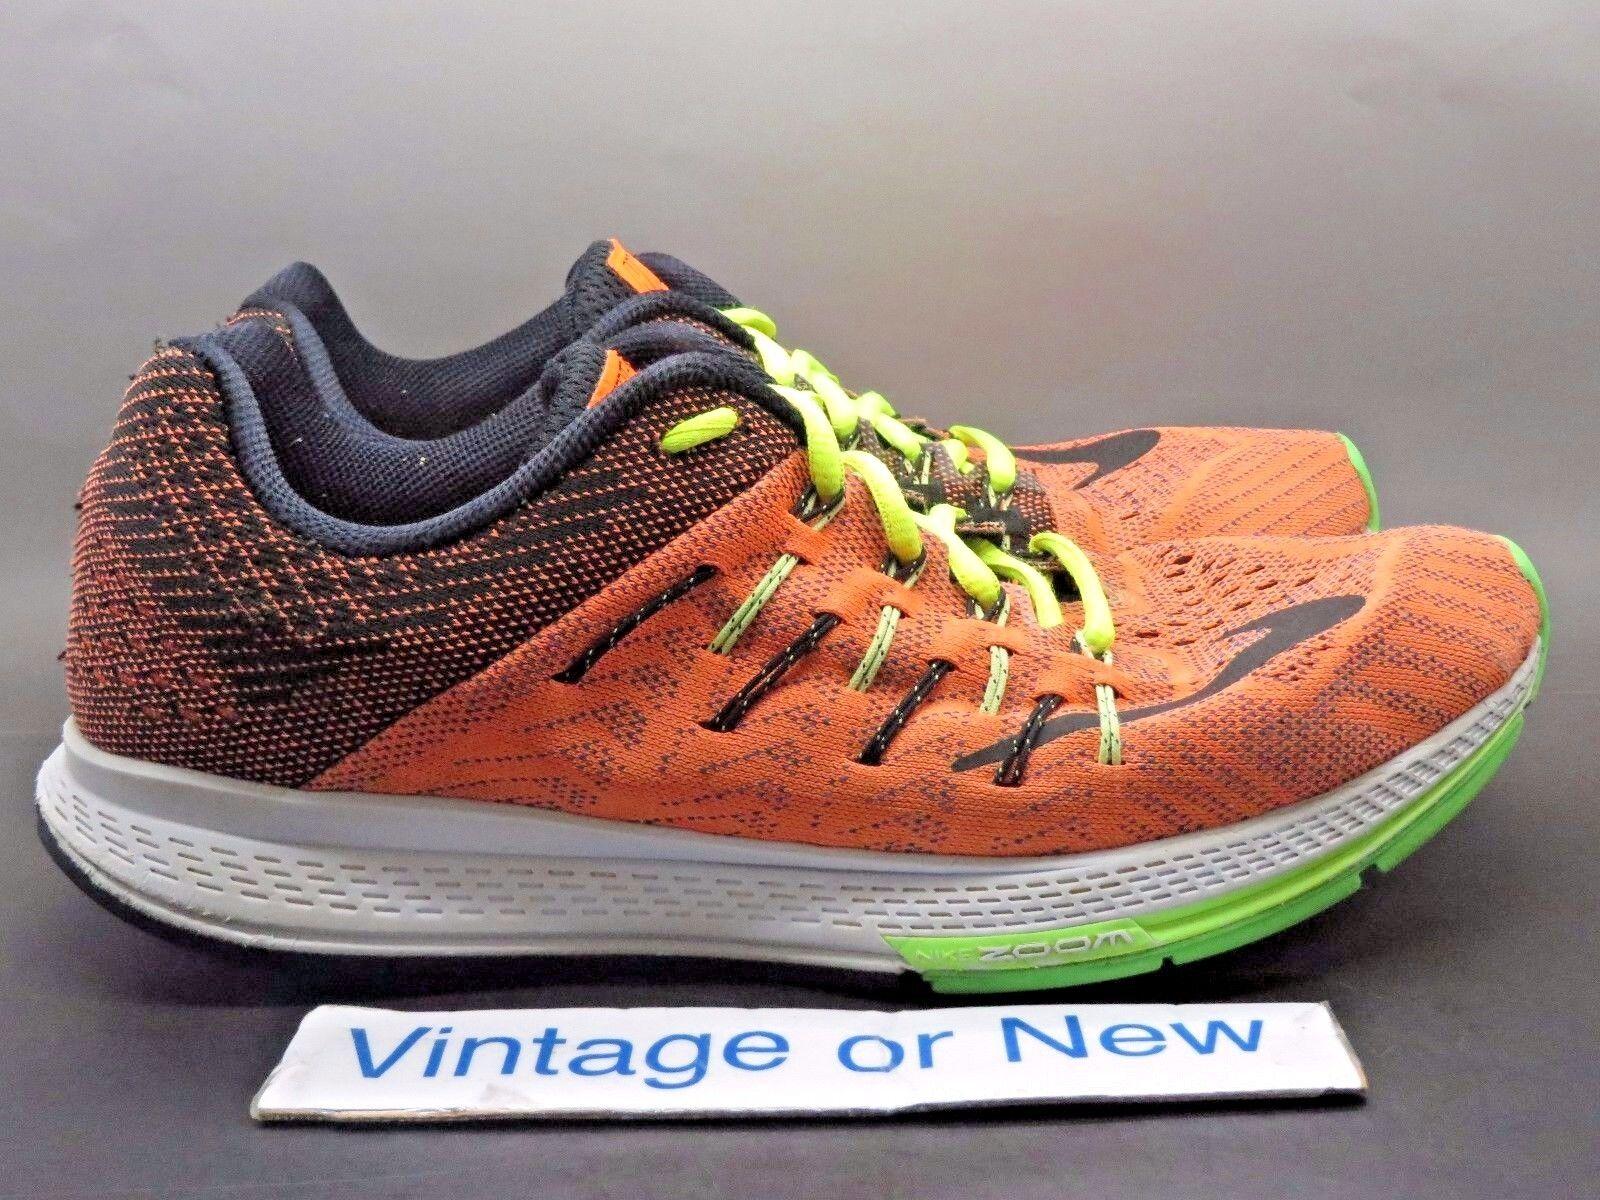 Men's Nike Zoom Elite 8 Total Orange Black Ghost Green Running 748588-803 Price reduction best-selling model of the brand